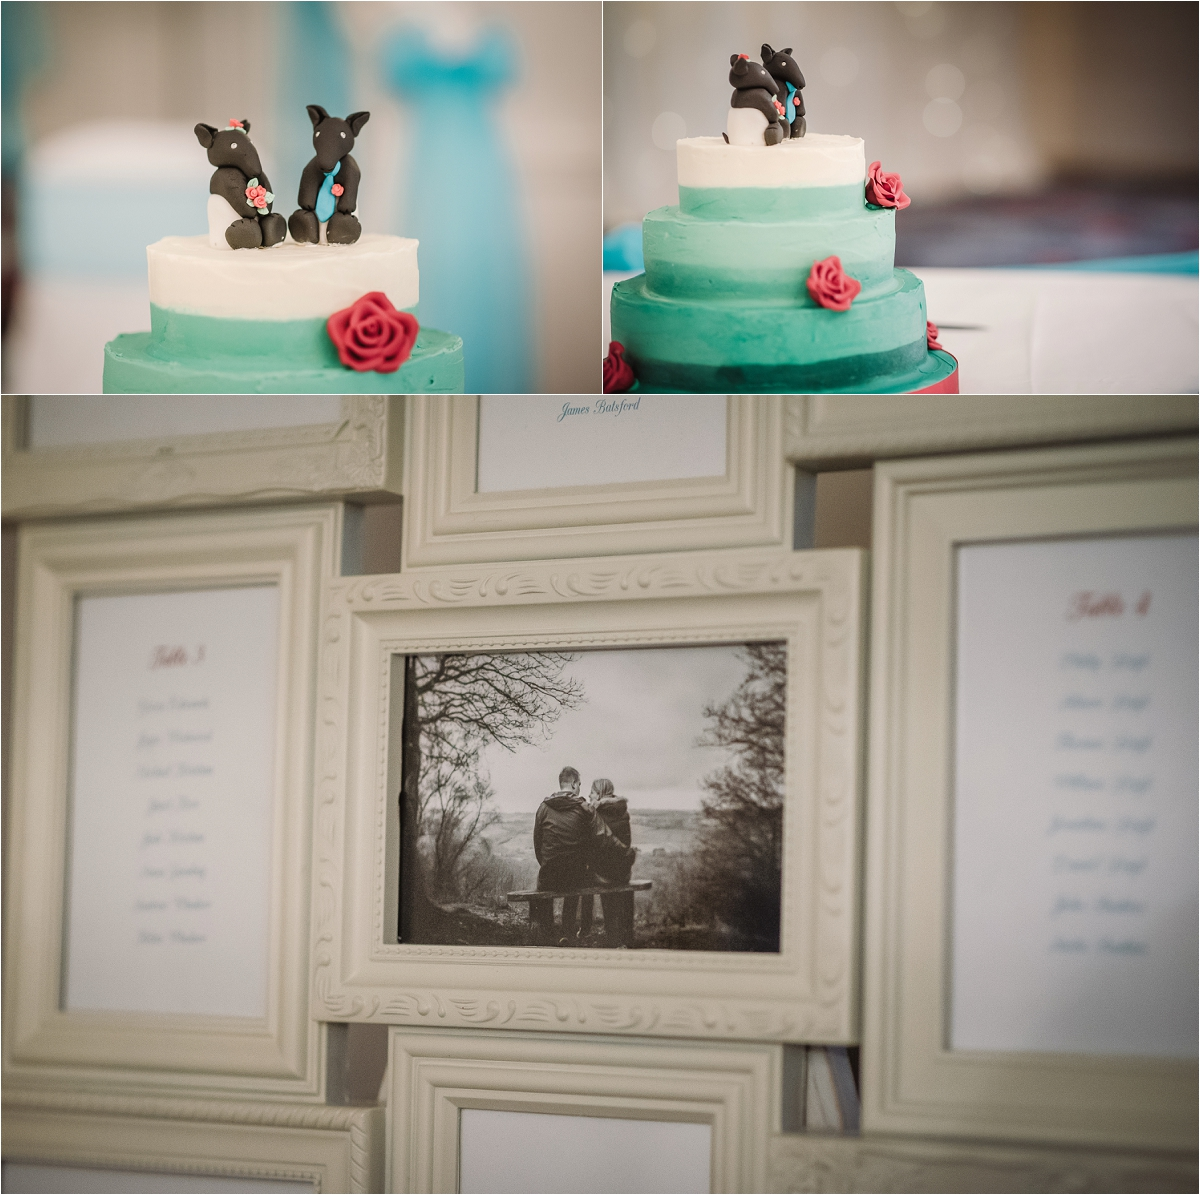 dan_emma_wedding_0029.jpg